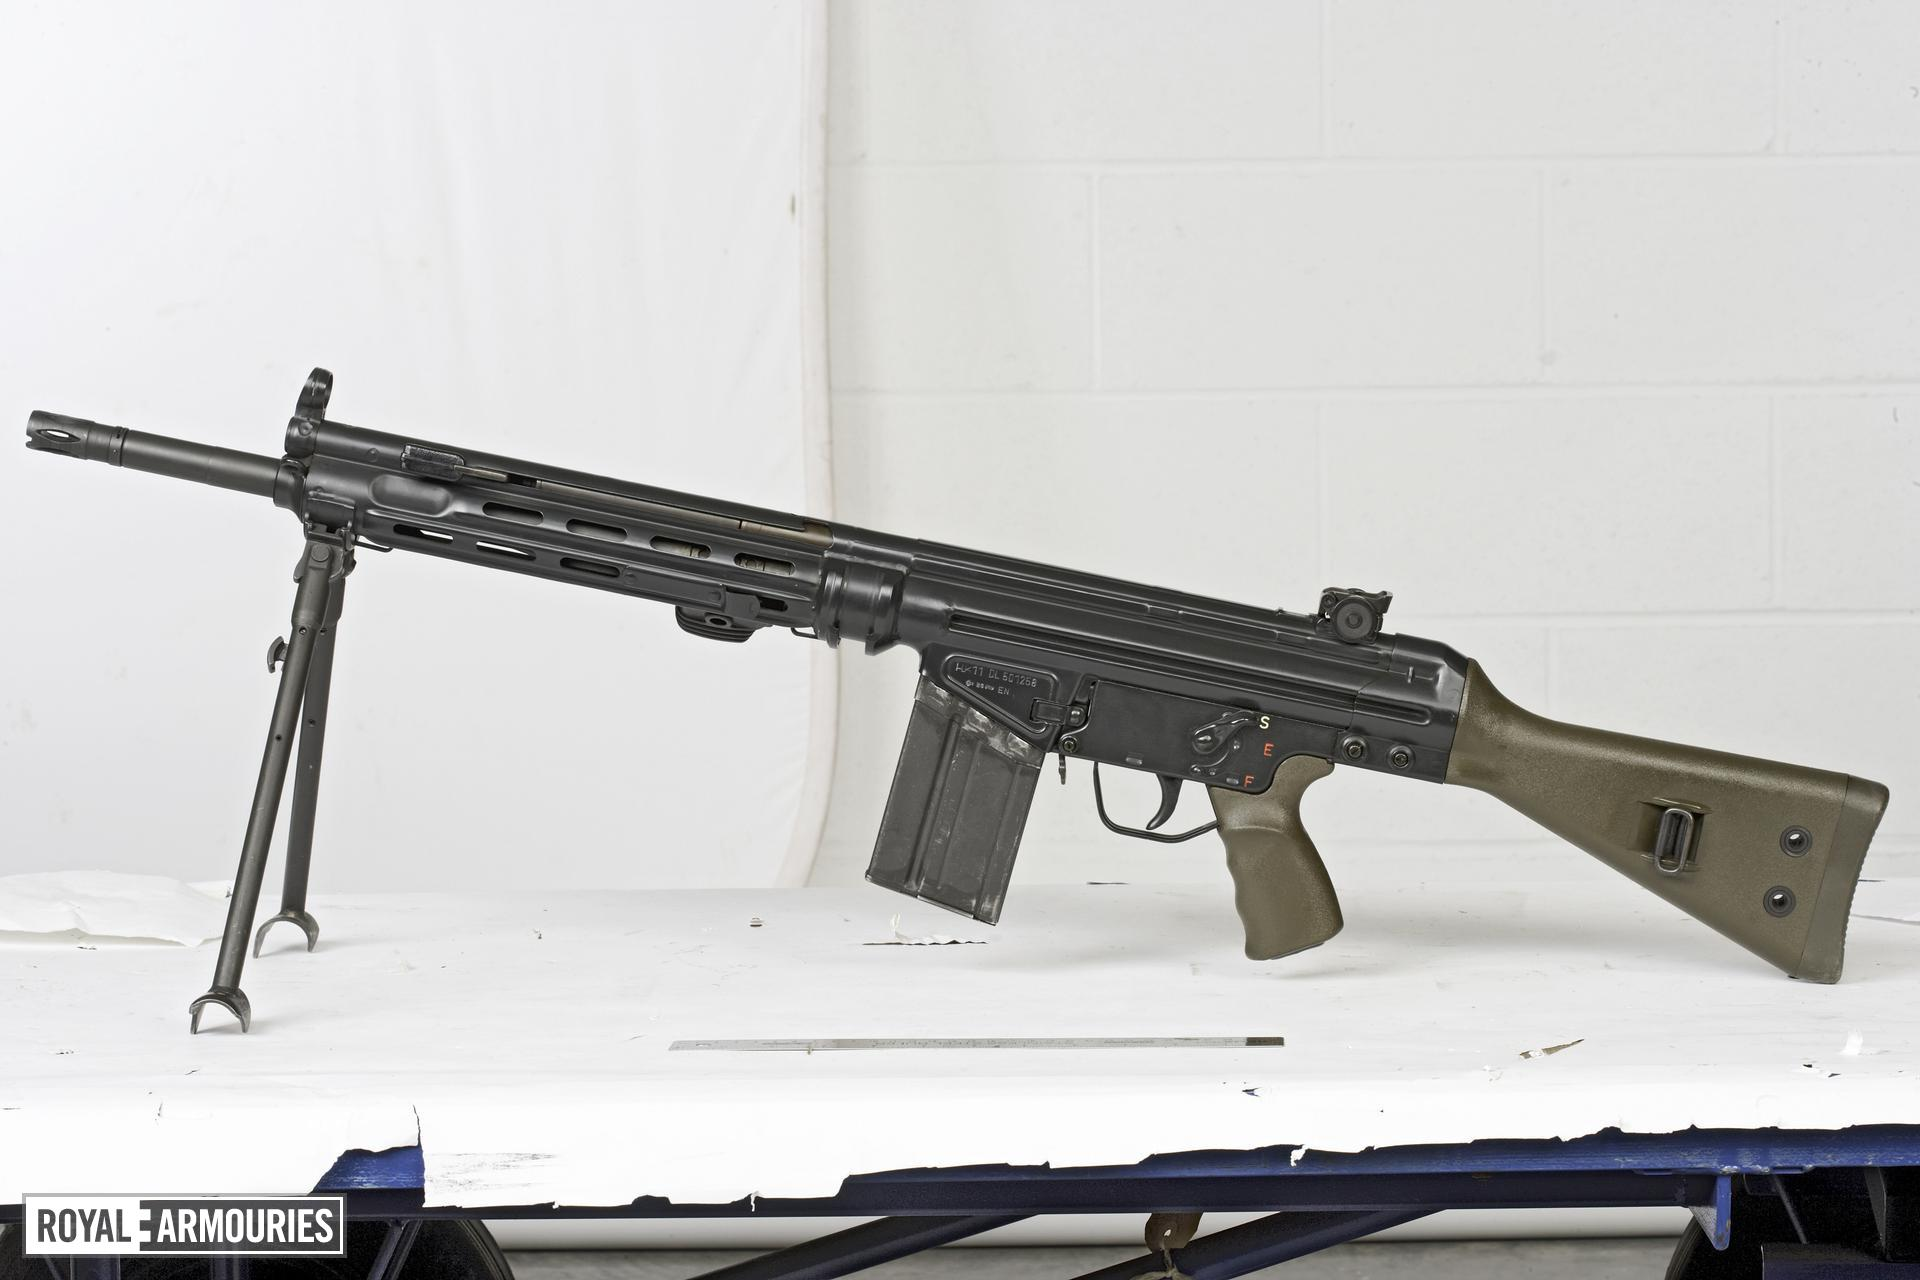 Centrefire automatic light machine gun - Heckler and Koch Hk11